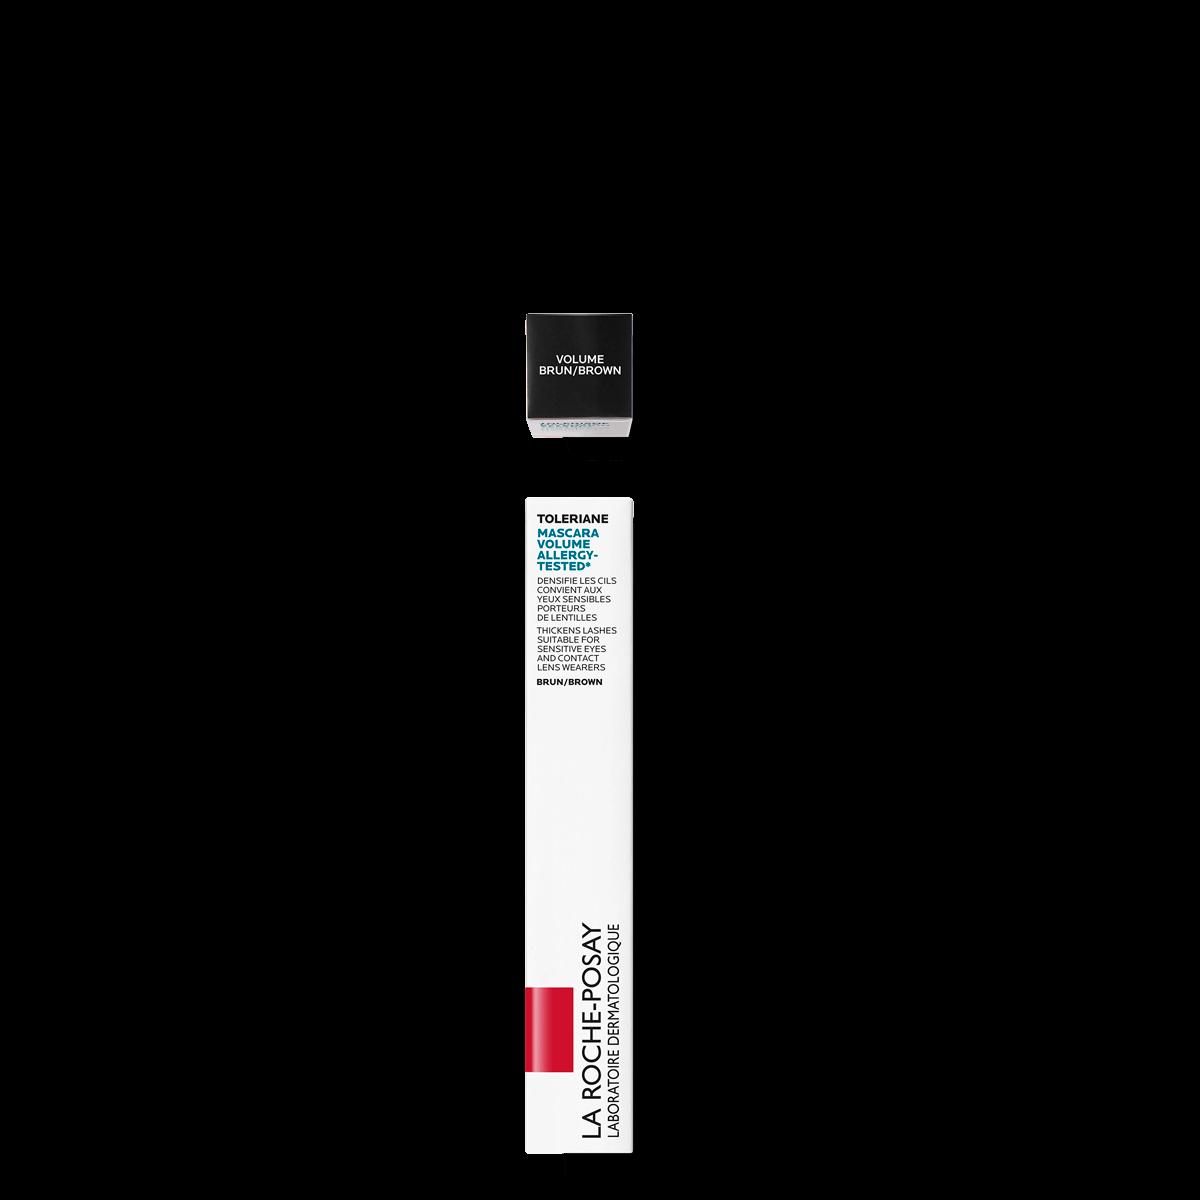 La Roche Posay Känslig Toleriane Make up VOLUME MASCARA Brown 333787